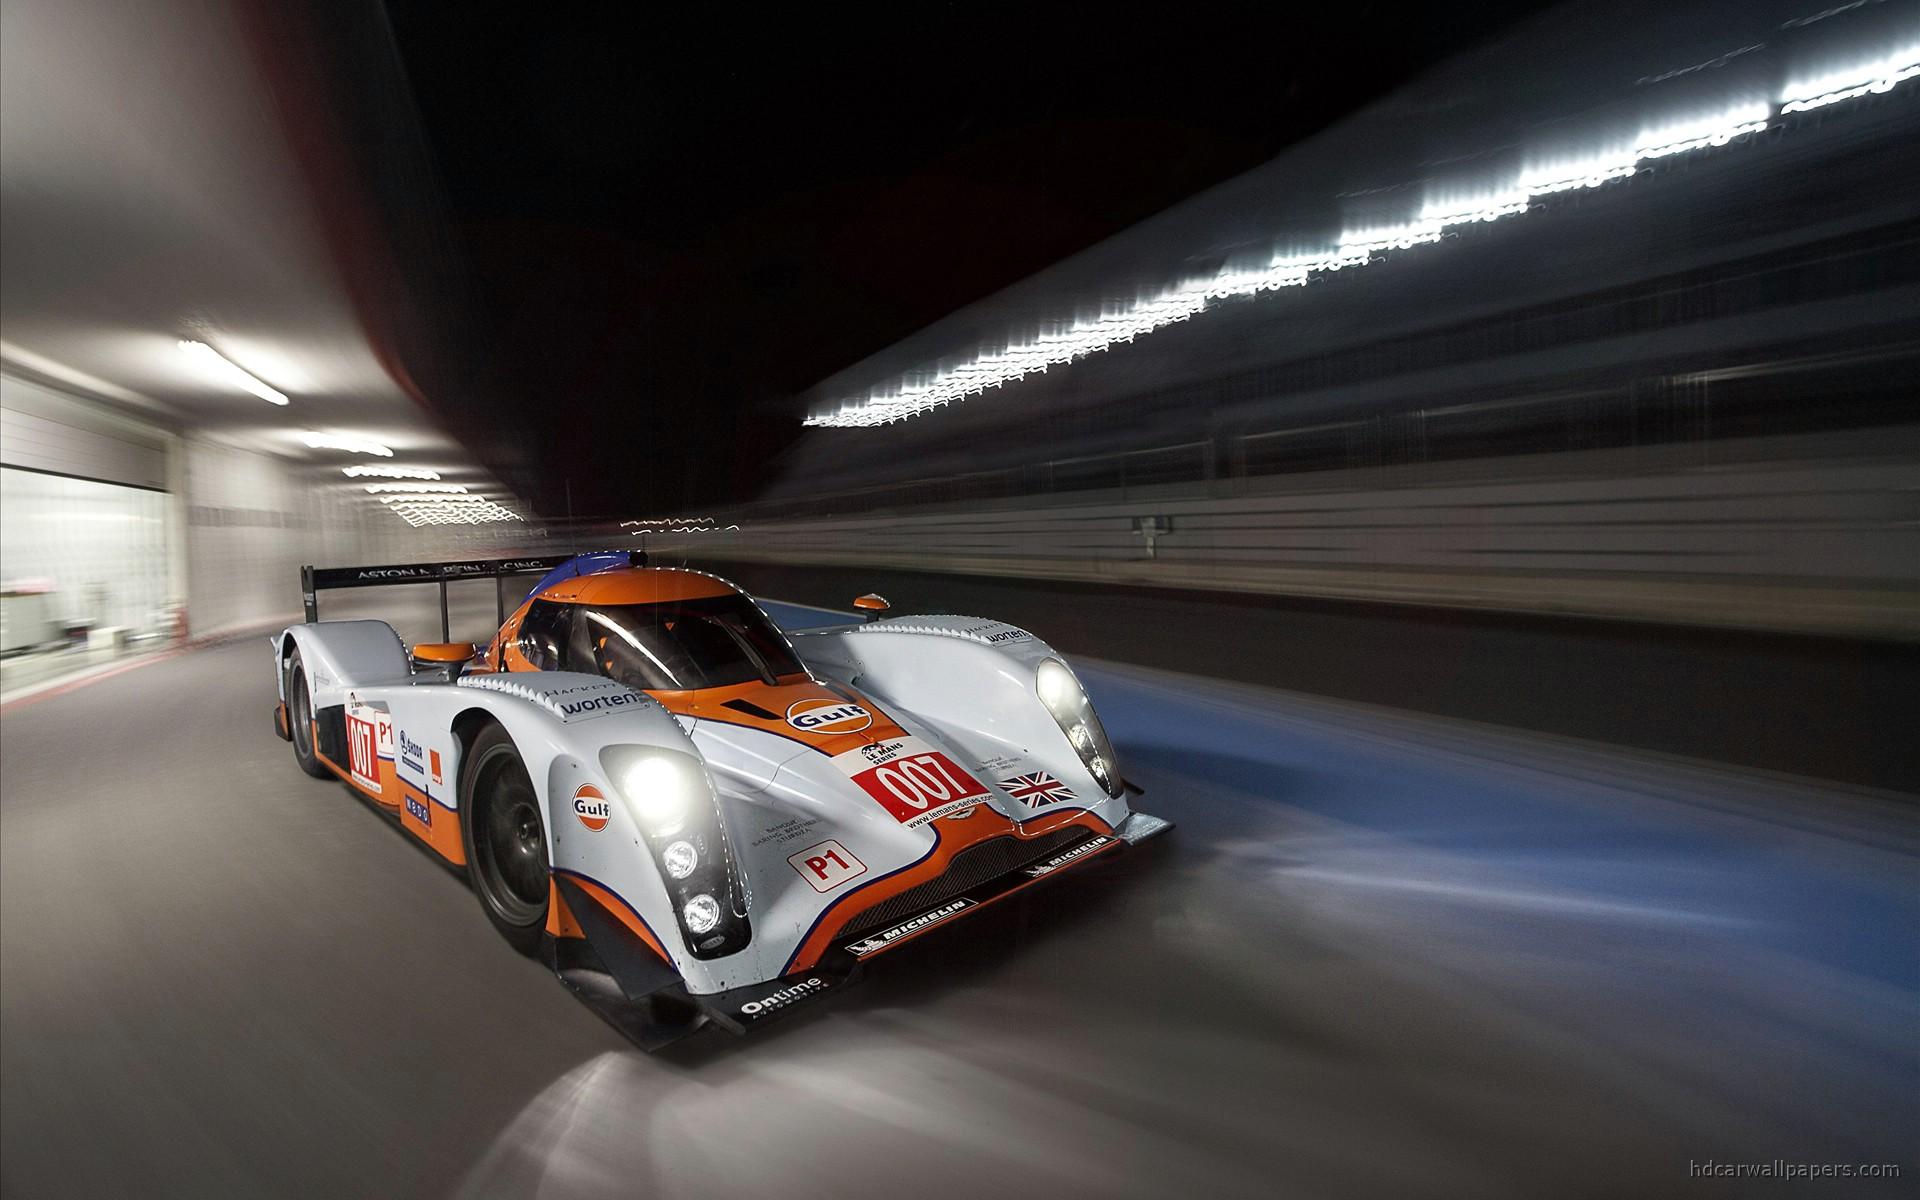 Aston Martin Night Race Wallpaper Hd Car Wallpapers Id 42